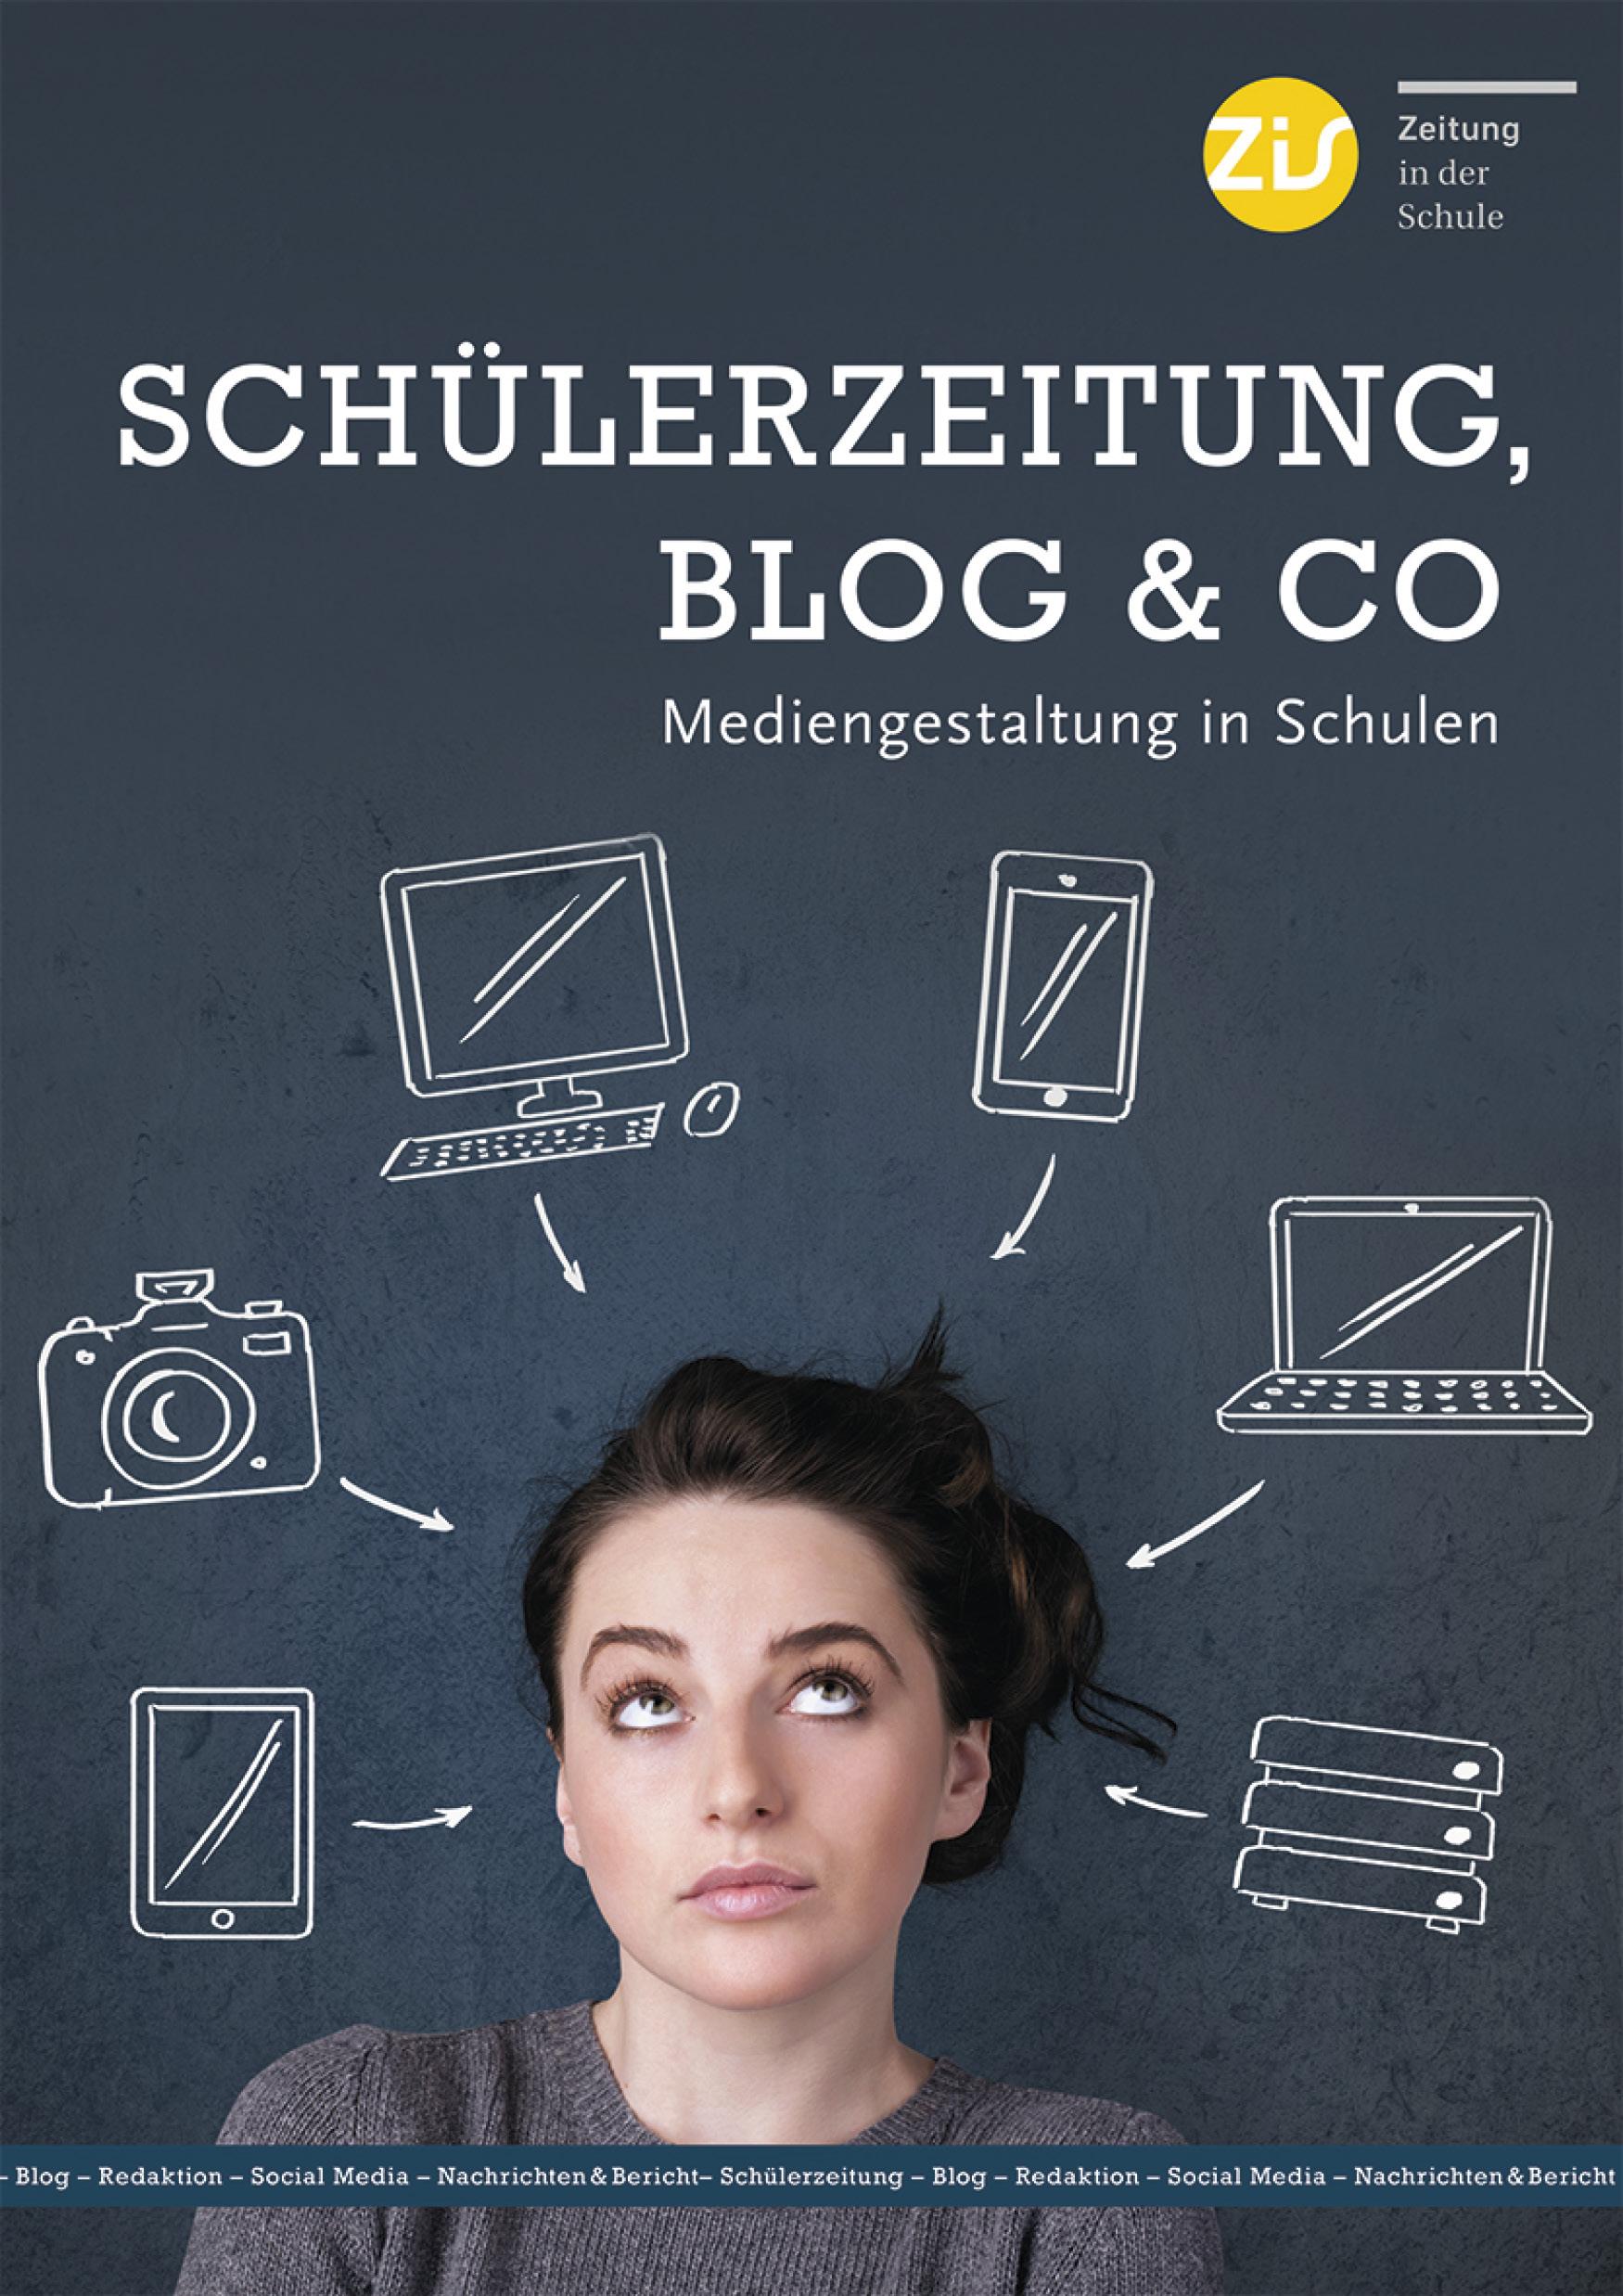 Schülerzeitung, Blog & Co - Mediengestaltung in Schulen